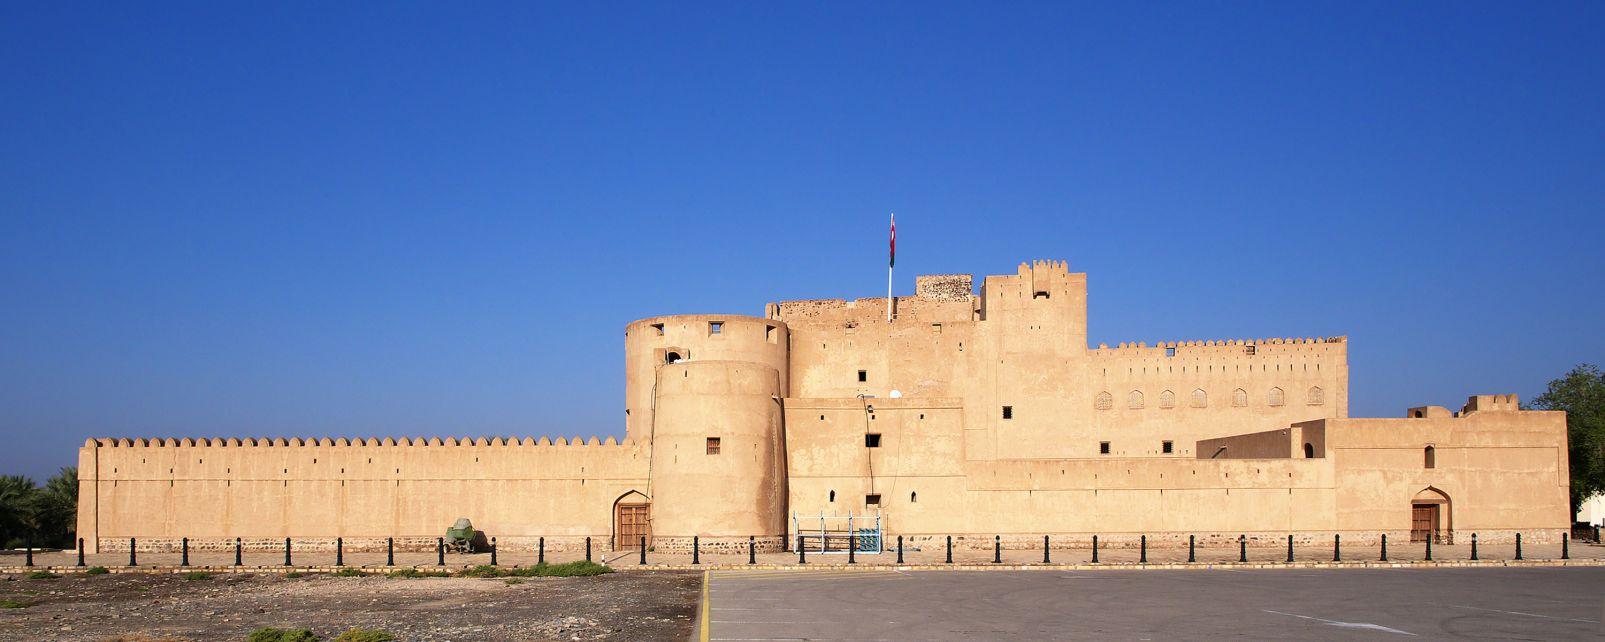 Jabrin Fort Oman